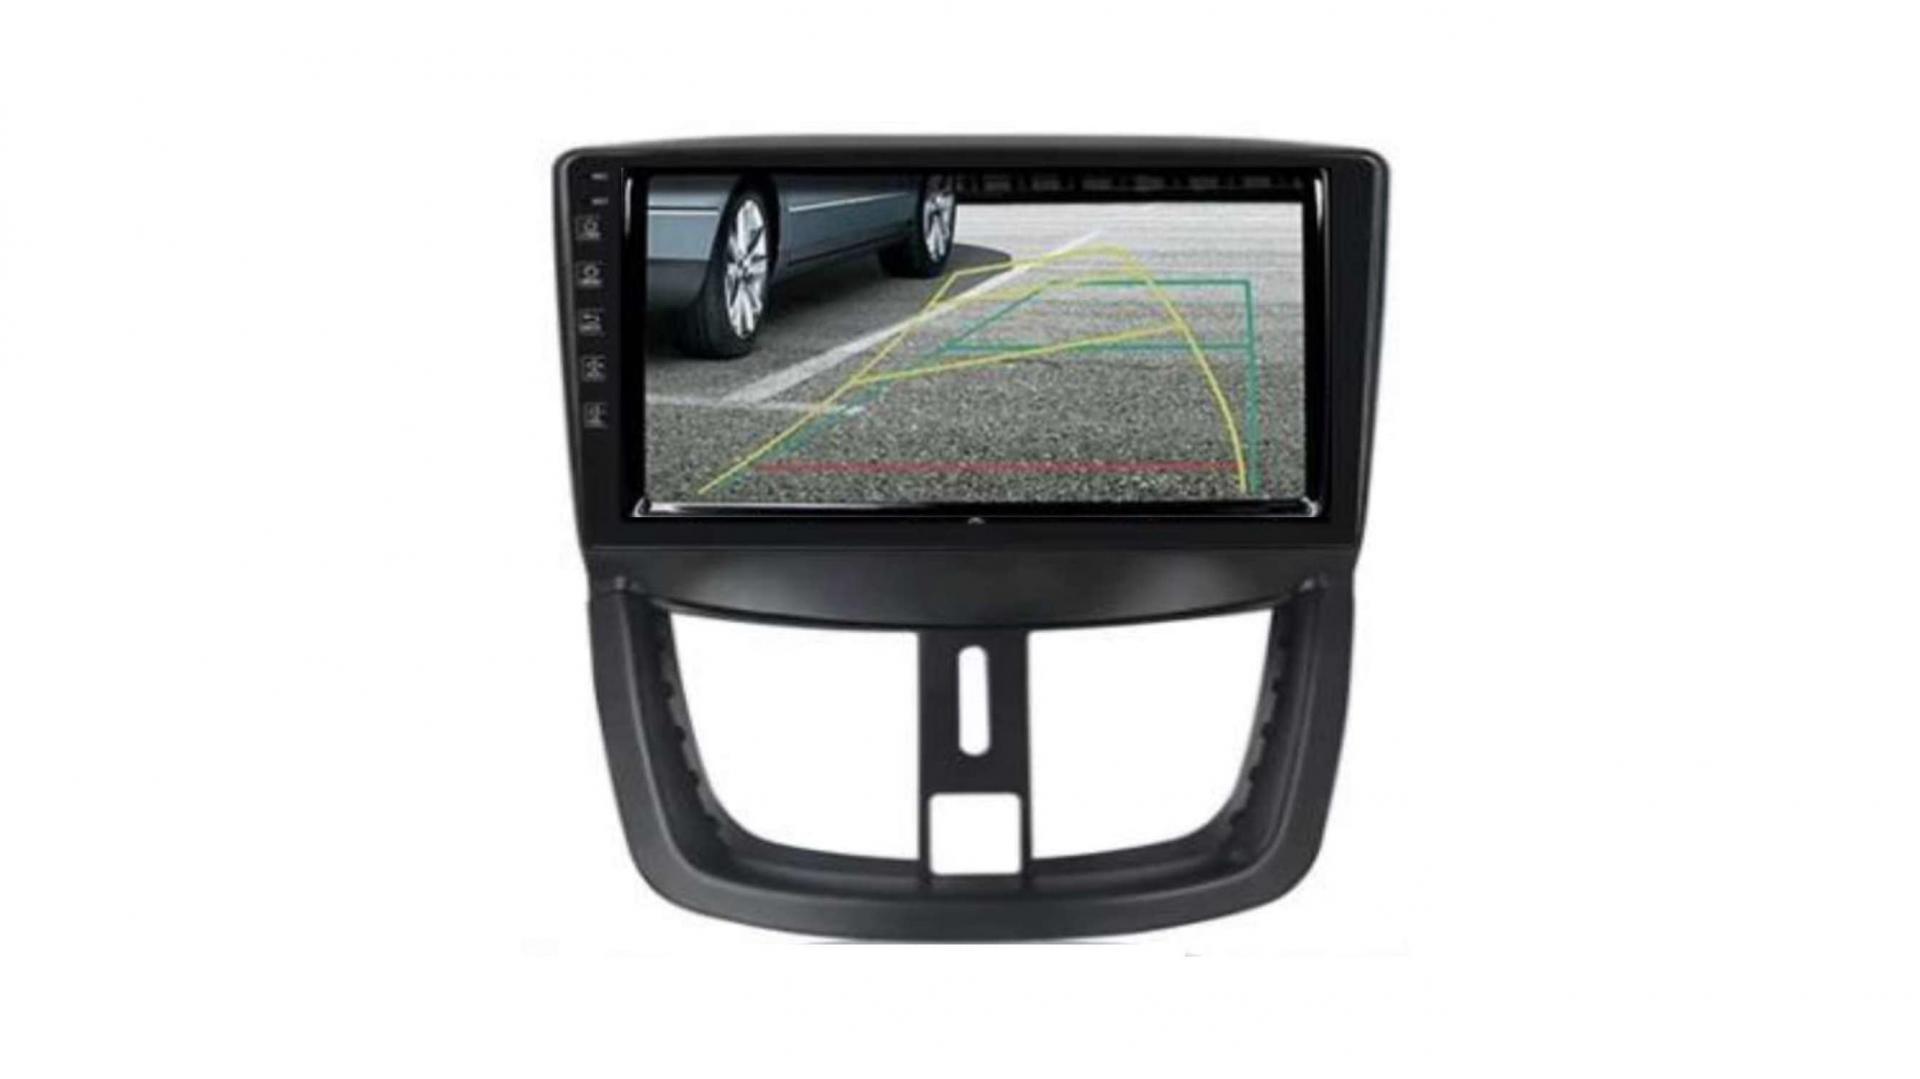 Peugeot 206 207 3008 5008 408 rcz autoradio gps bluetooth android auto carplay camera de recul commande au volant3